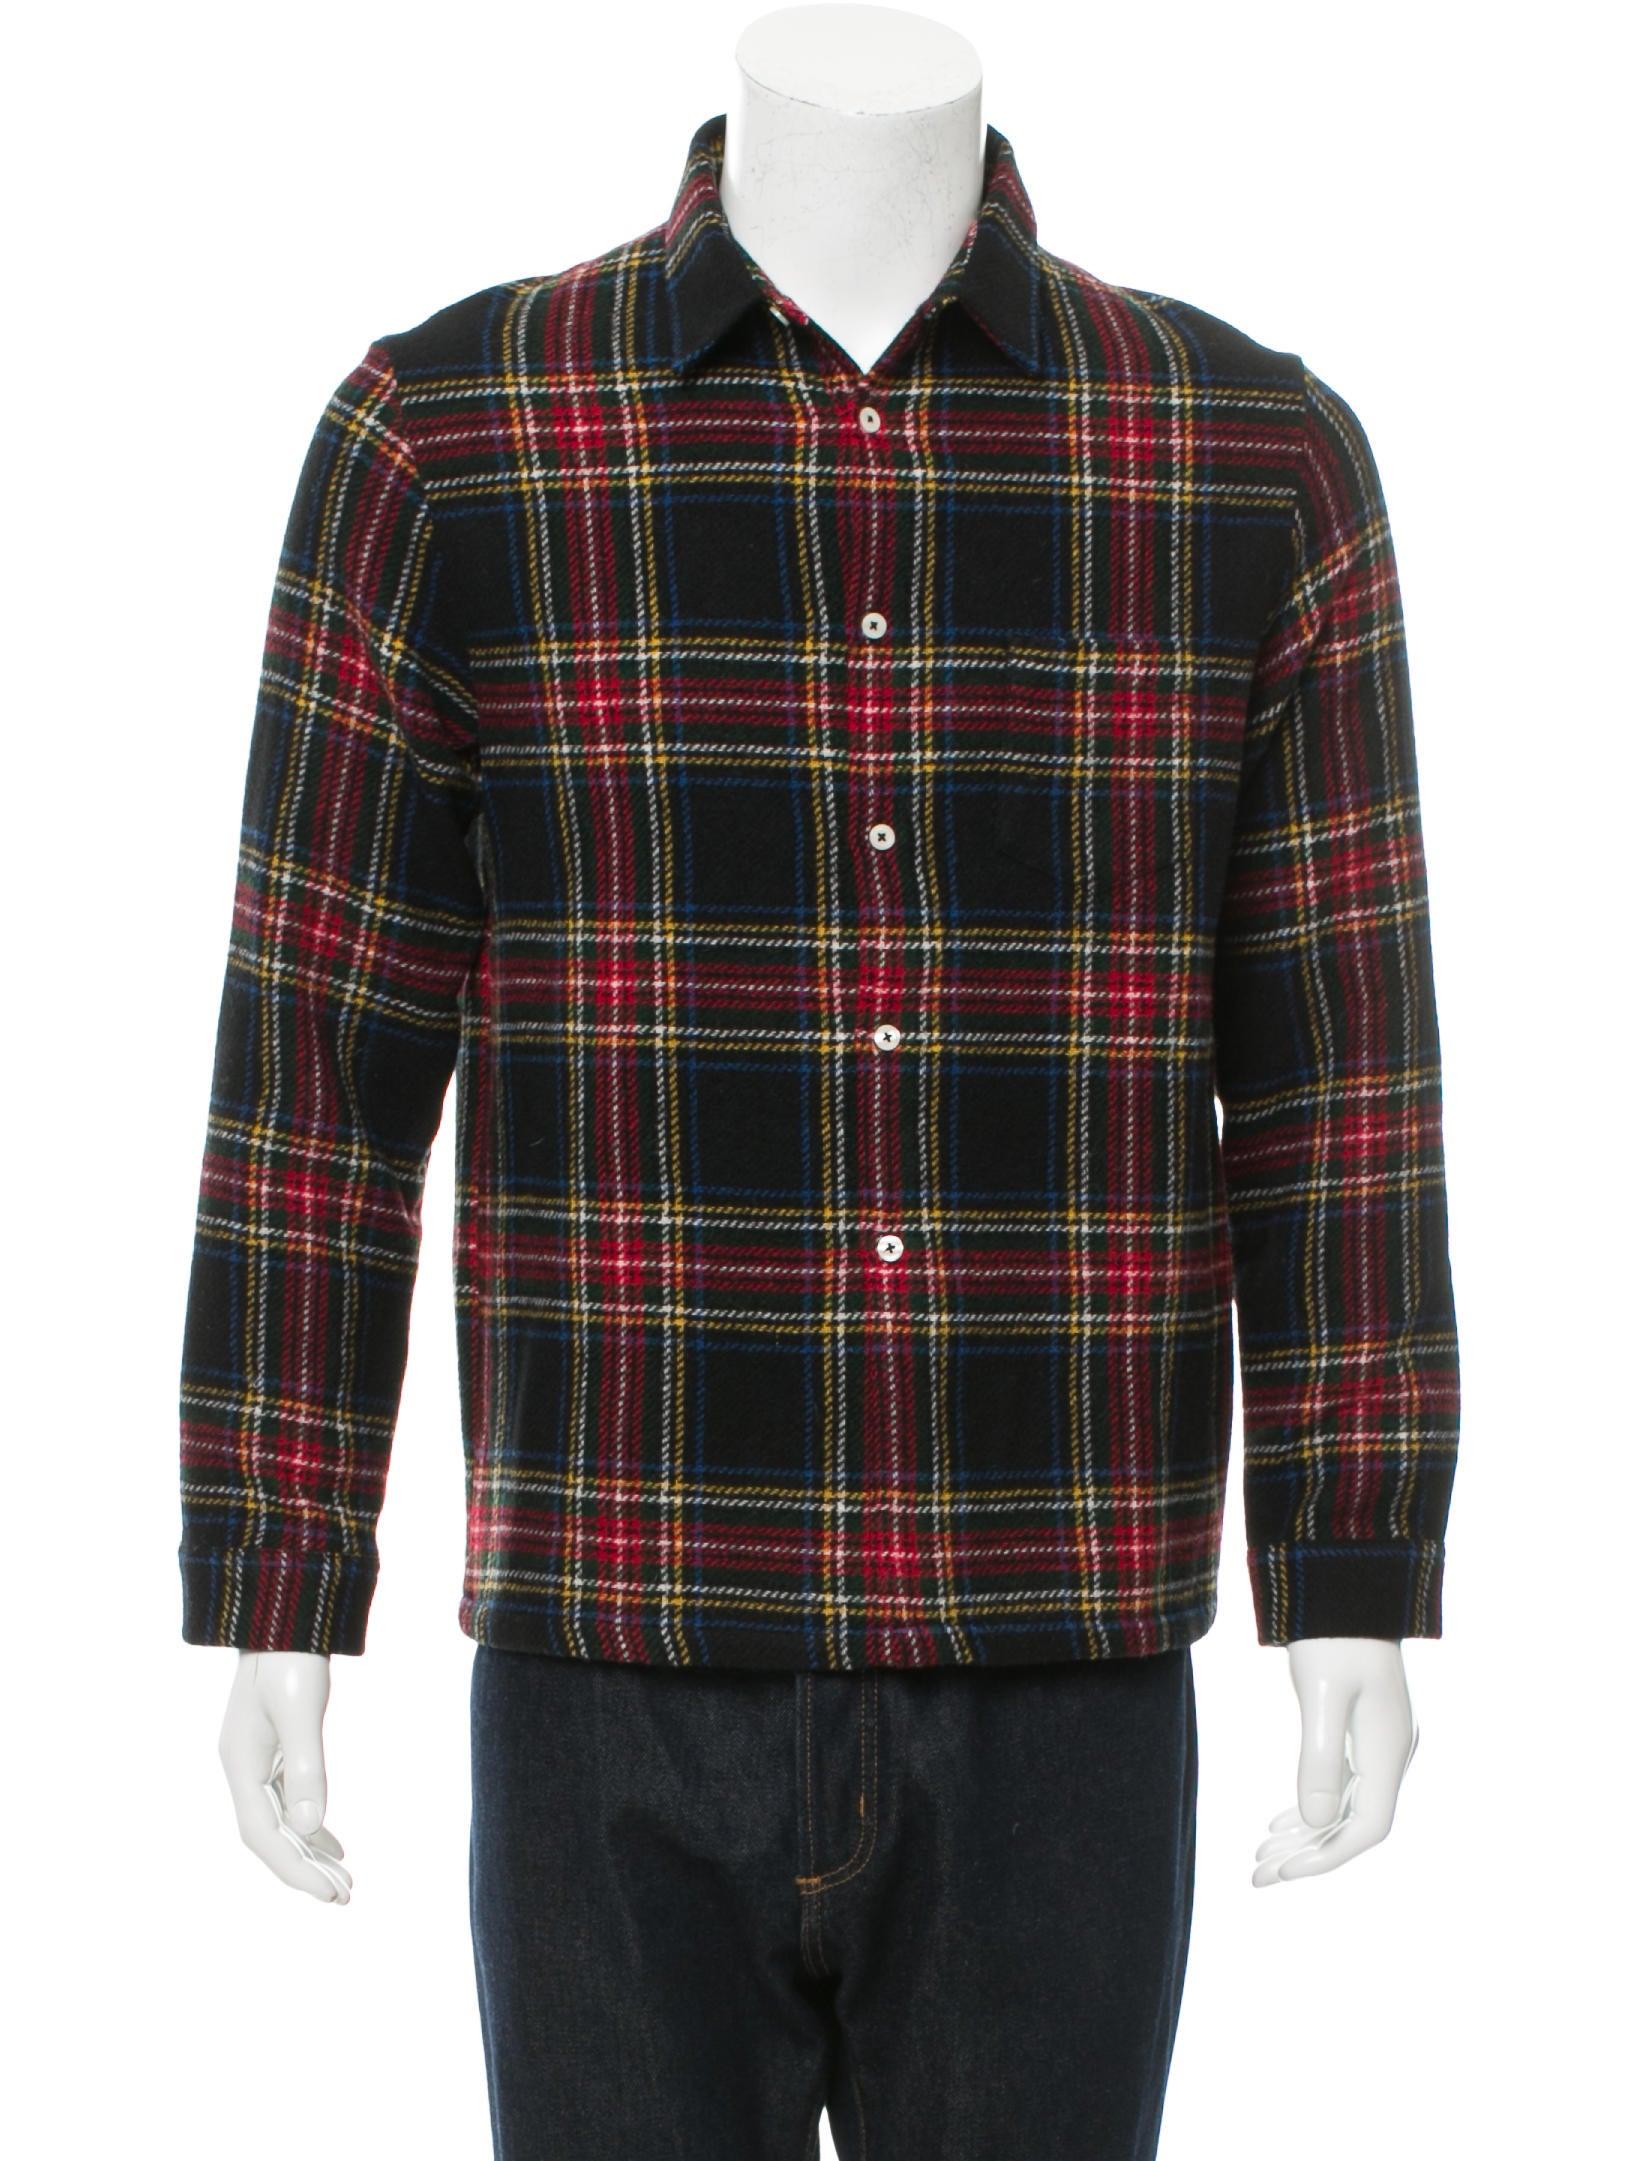 Ami alexandre mattiussi wool tartan flannel shirt w tags for Mens wool flannel shirt